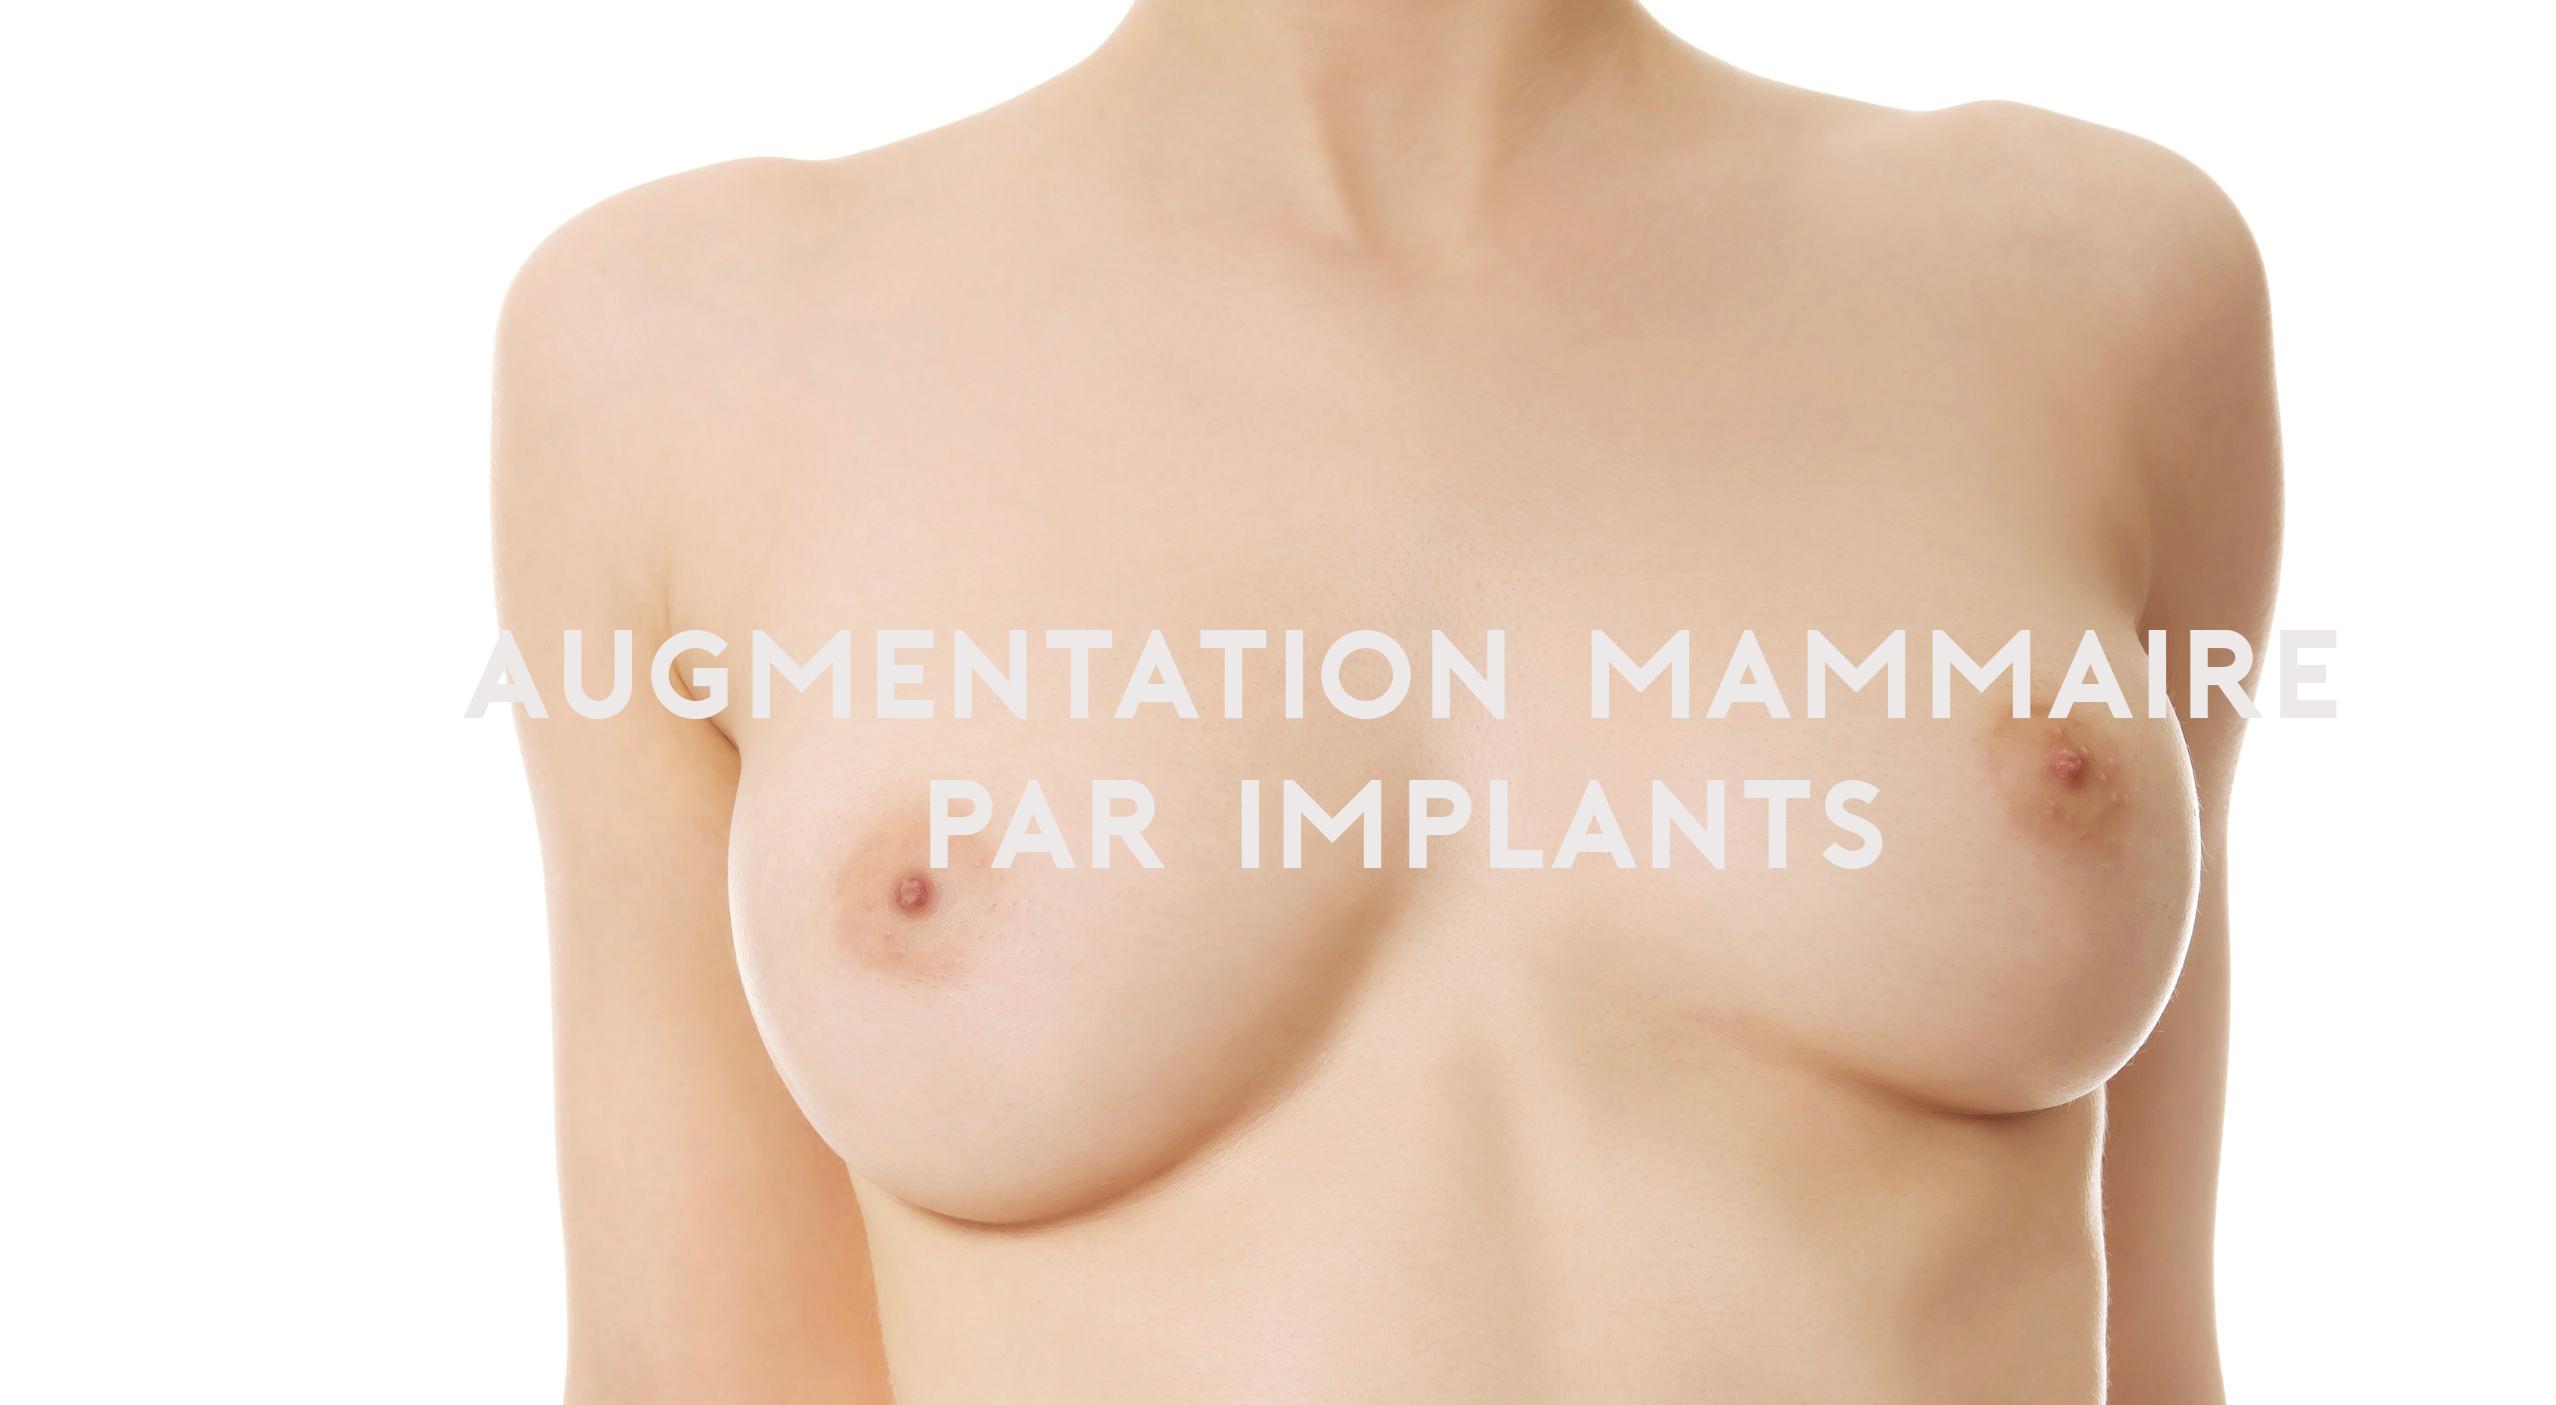 prothèses mammaires sein augmentation haute savoie